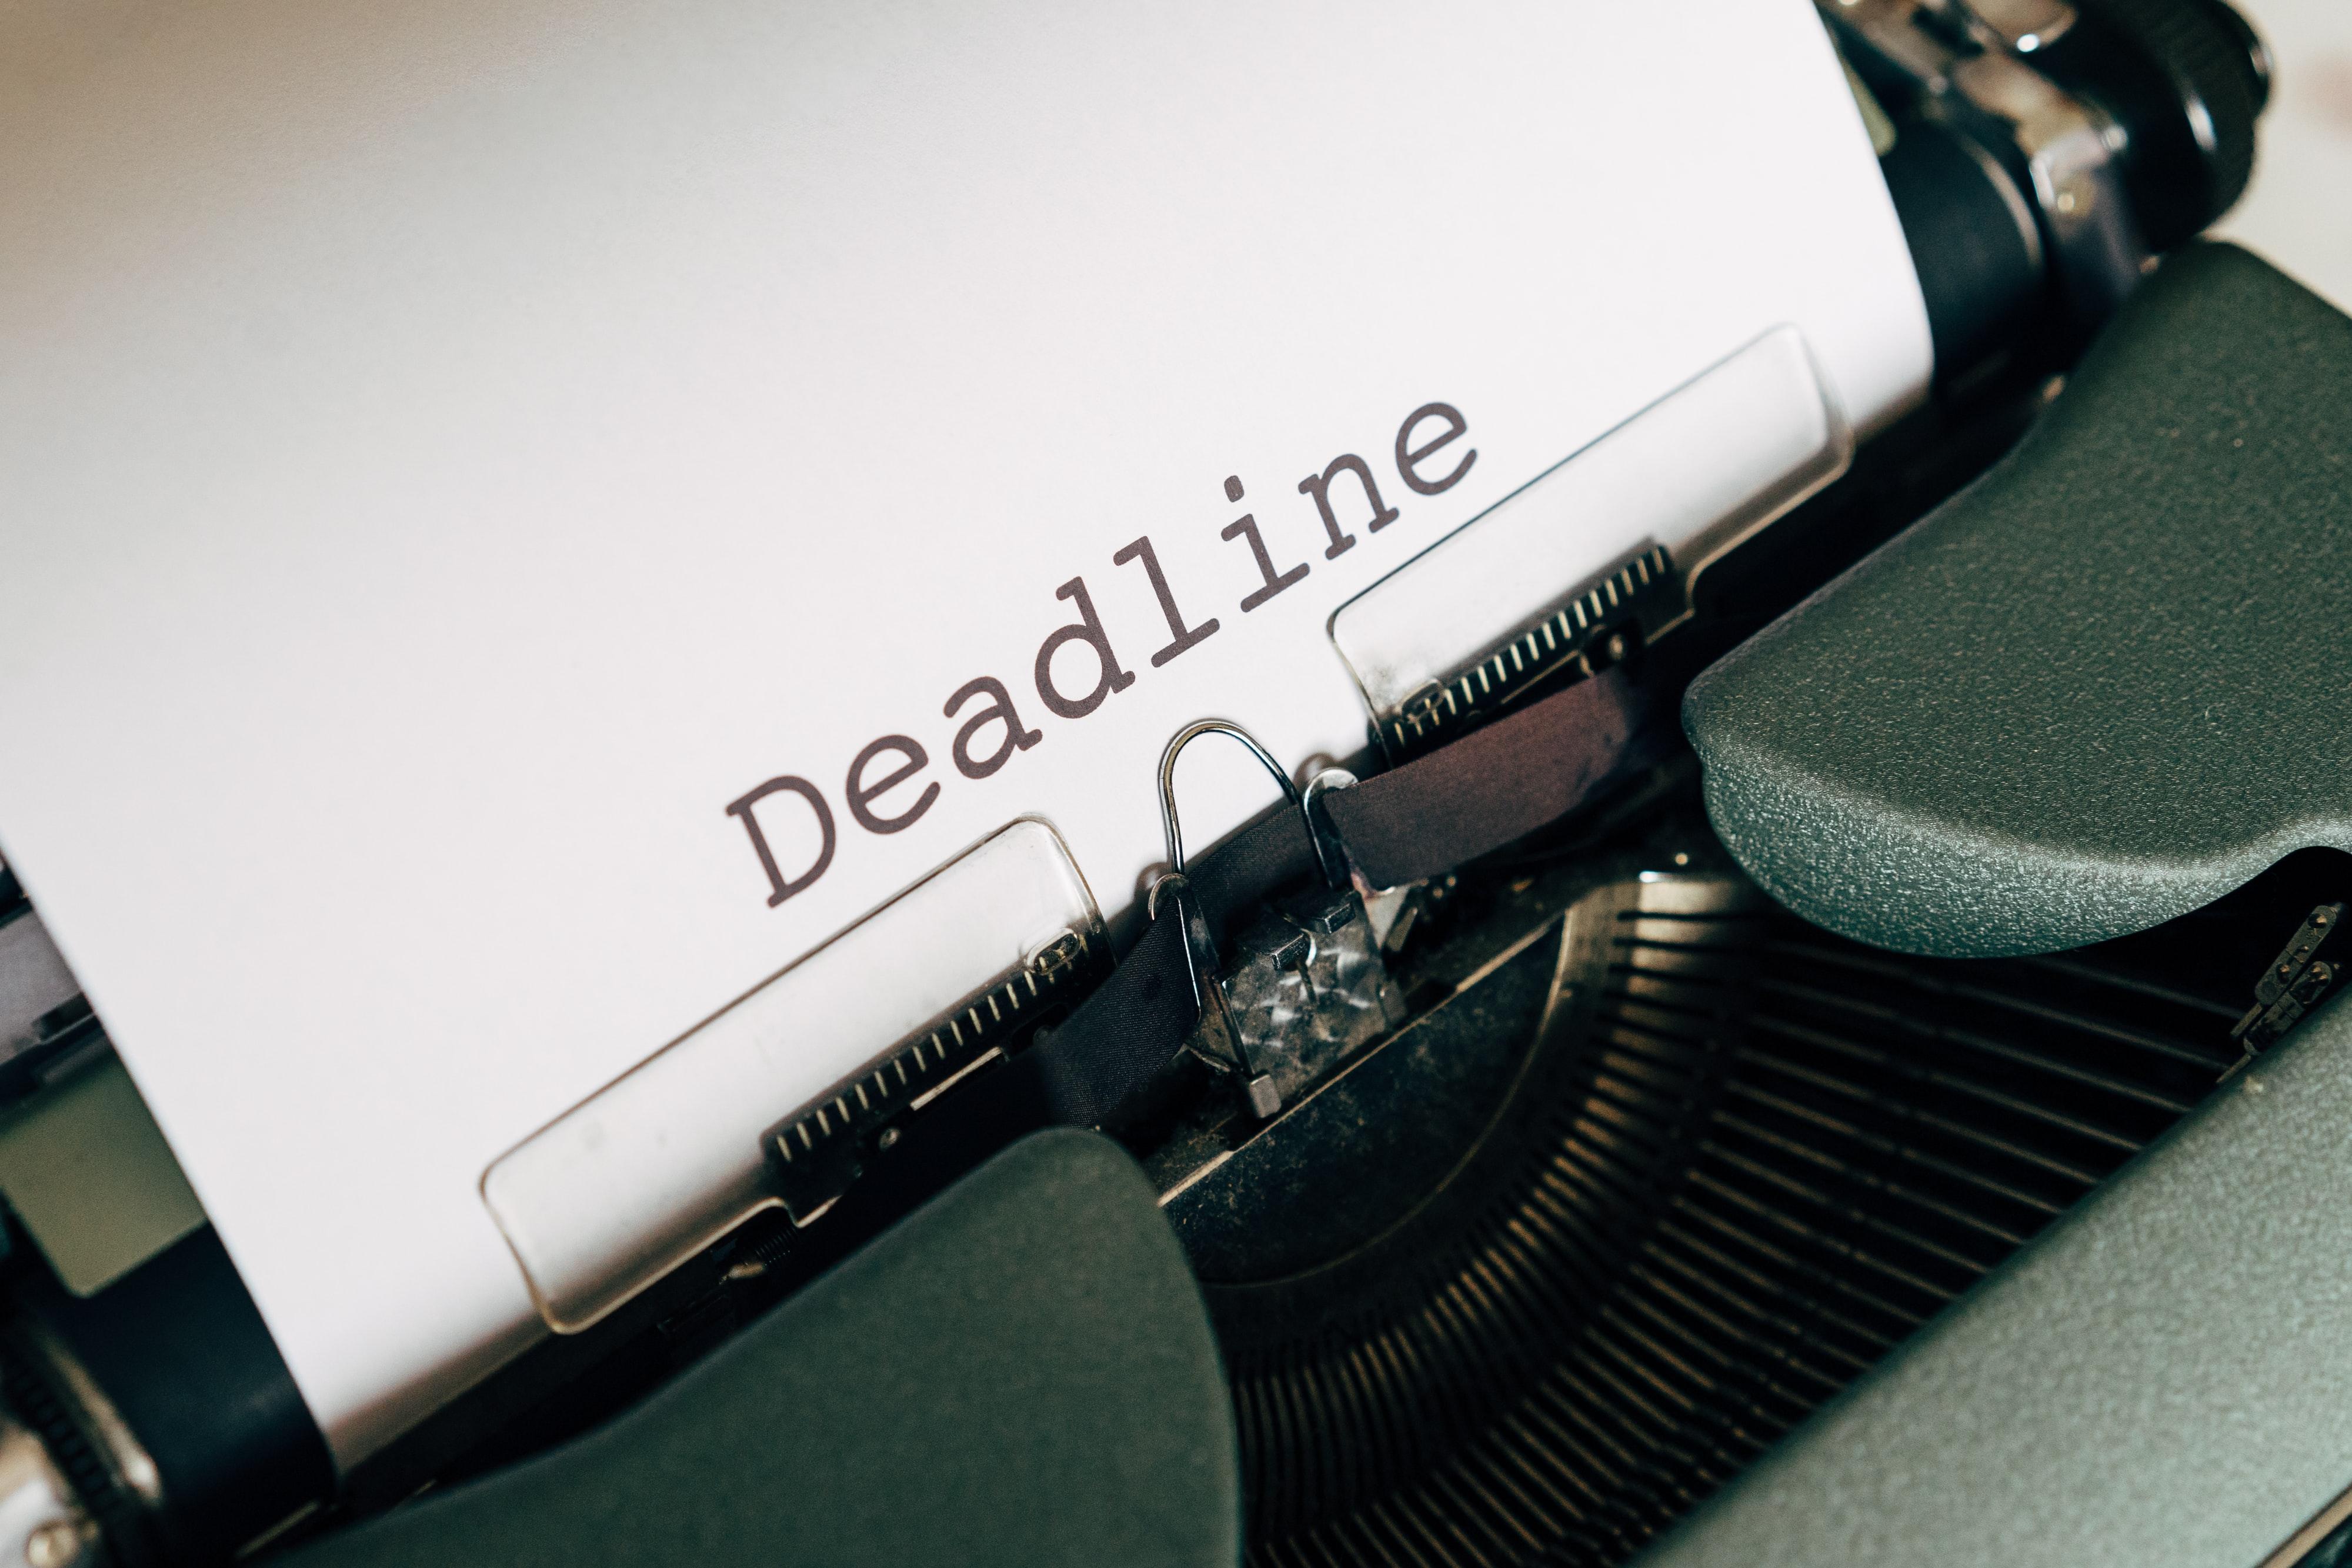 grant resources, grand deadlines